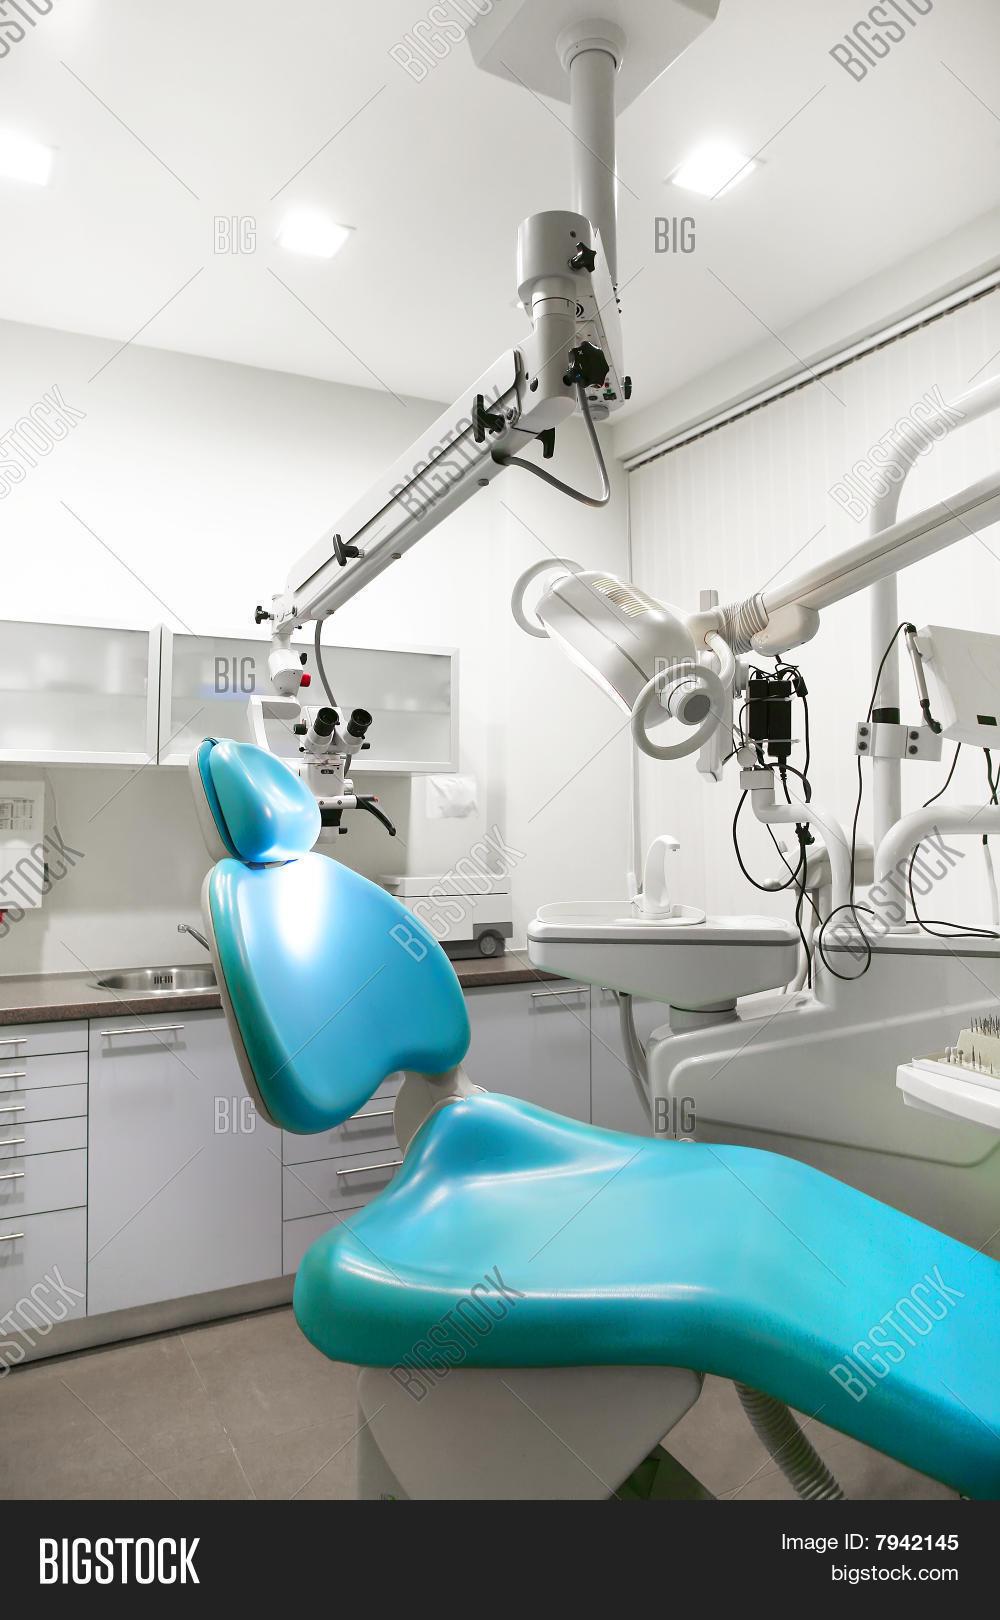 Dental Clinic Interior Image Photo Free Trial Bigstock